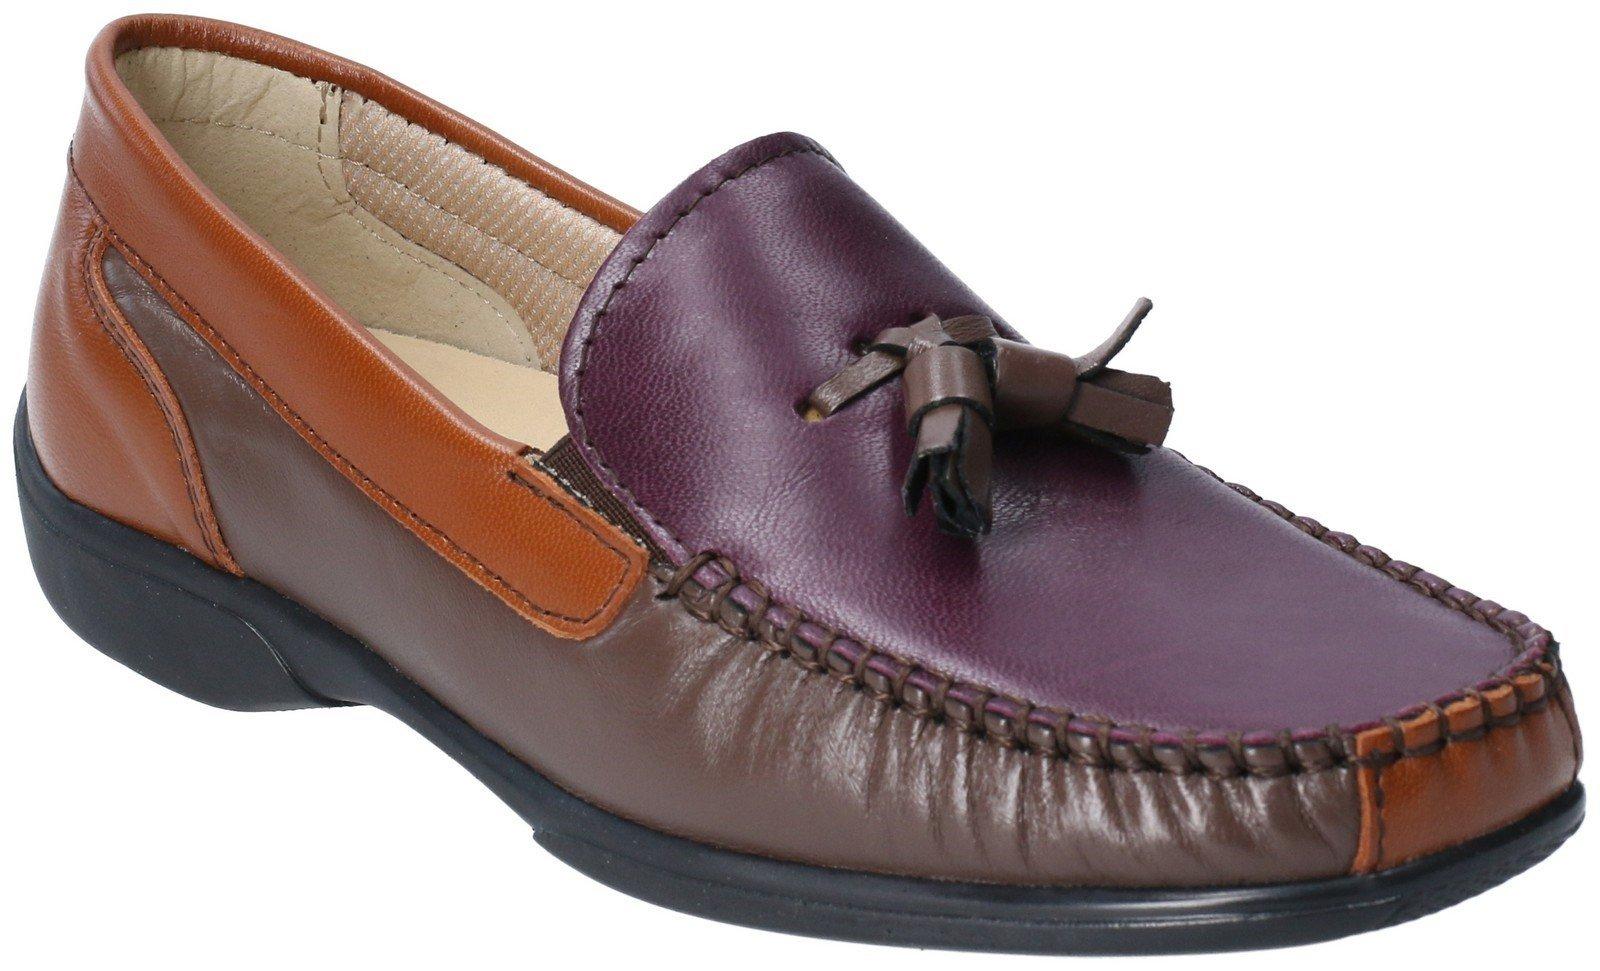 Cotswold Men's Biddlestone Slip On Loafer Shoe Various Colours 20285 - Chestnut/Purple 4